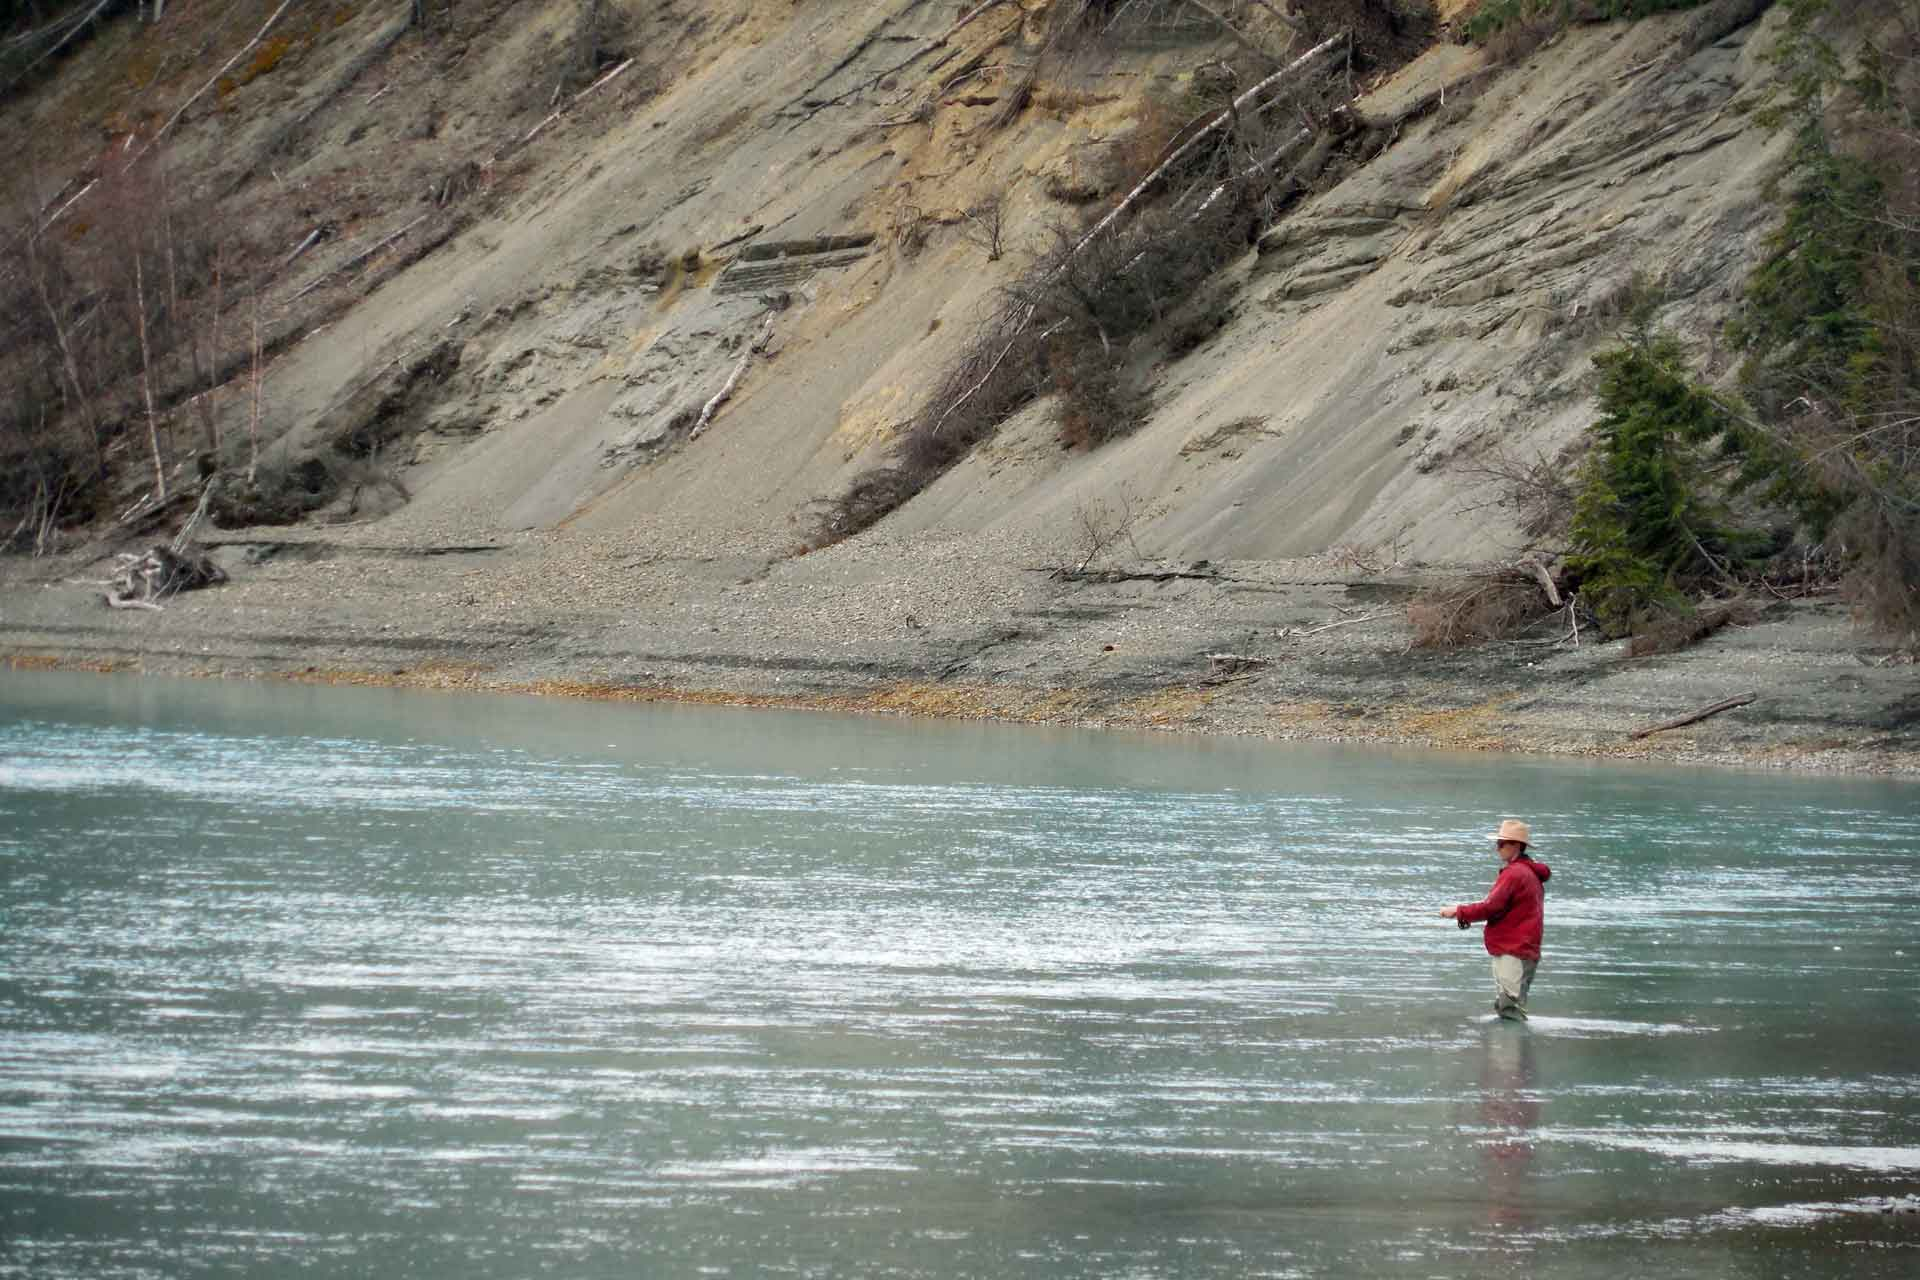 Kenai river fishing guides guided salmon fishing trips for Kenai river fishing